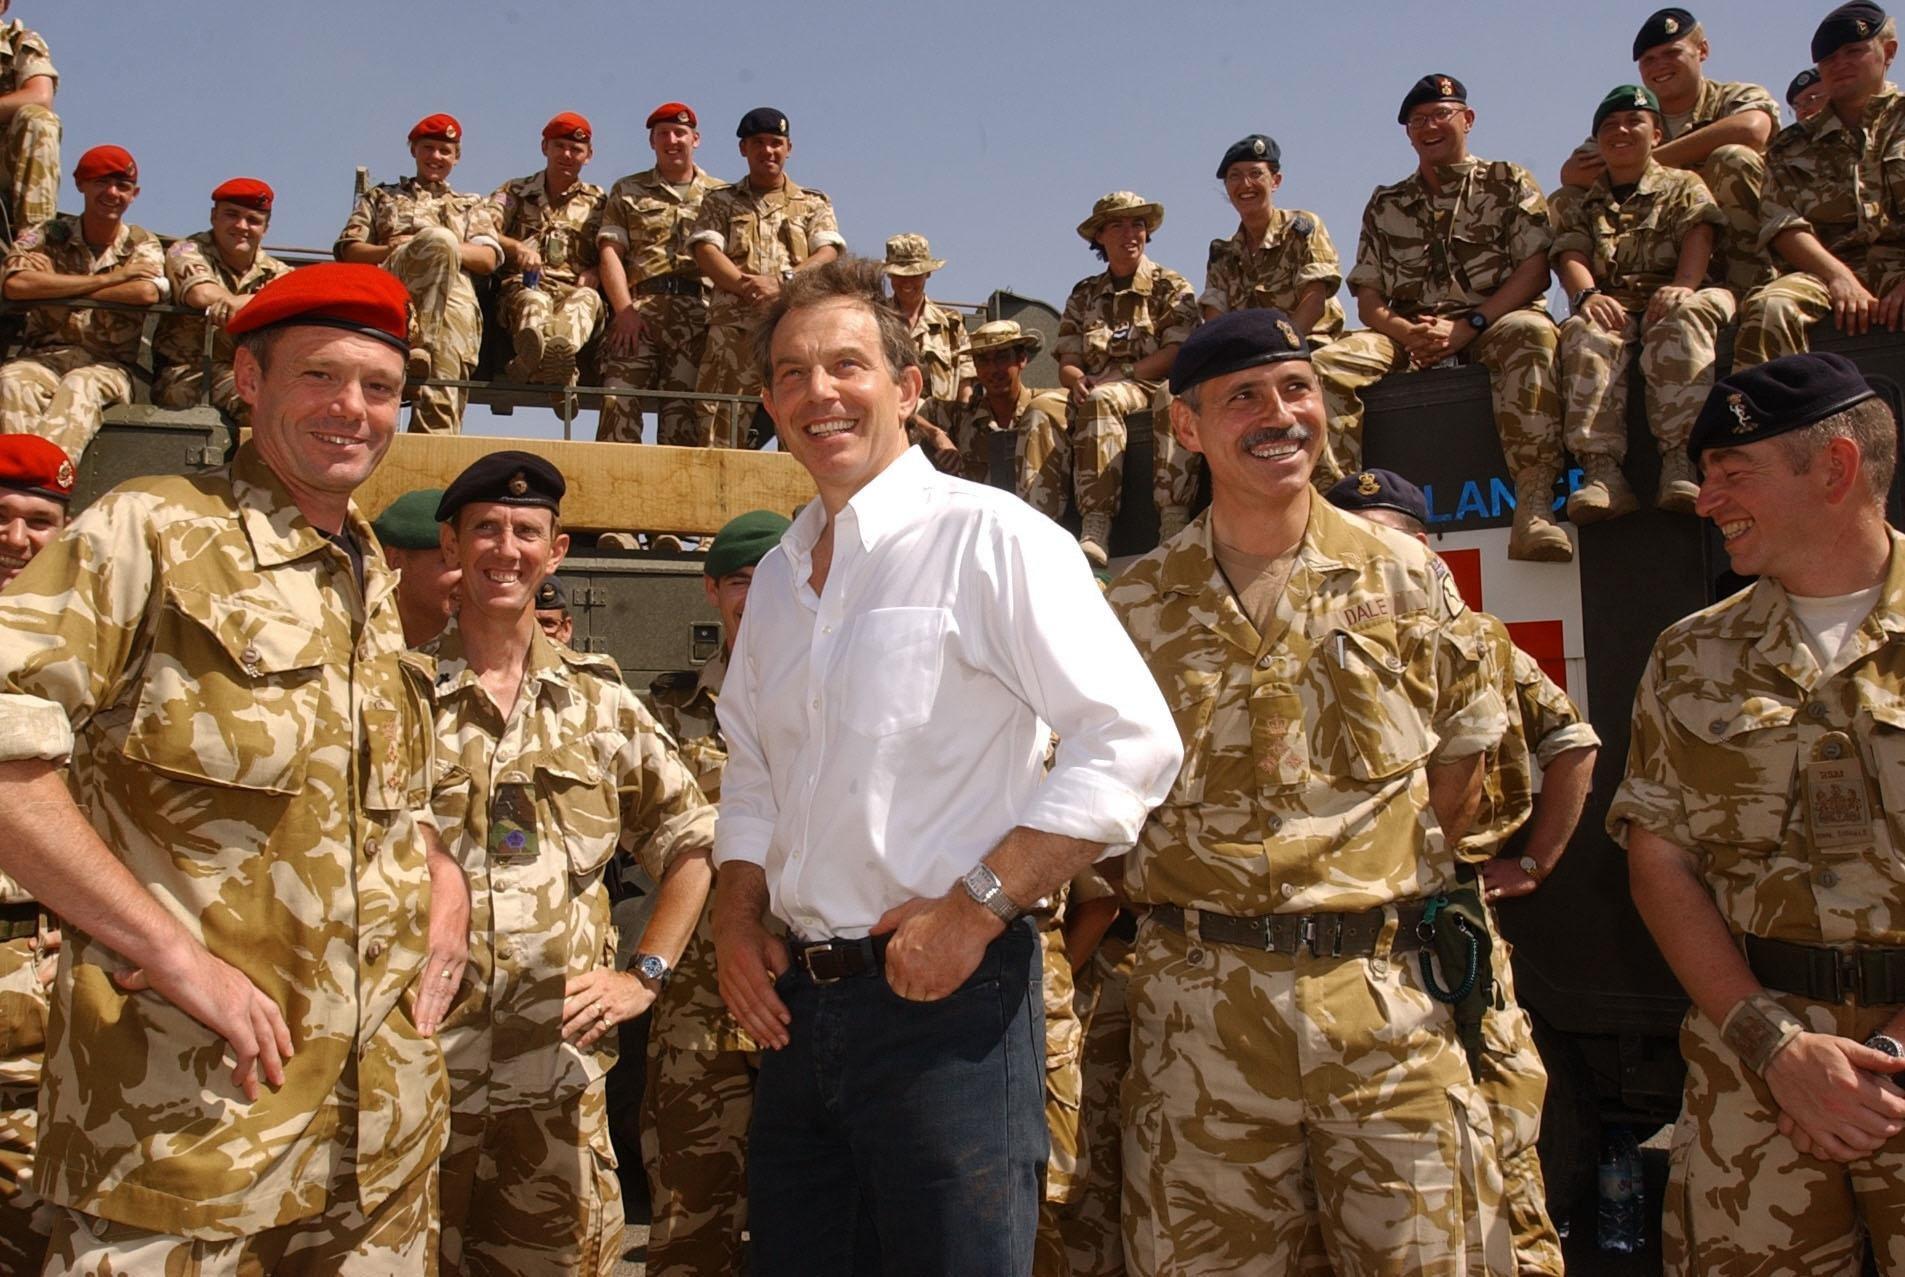 Chilcot report: Tony Blair rushed 'ill-prepared' troops into Iraq War